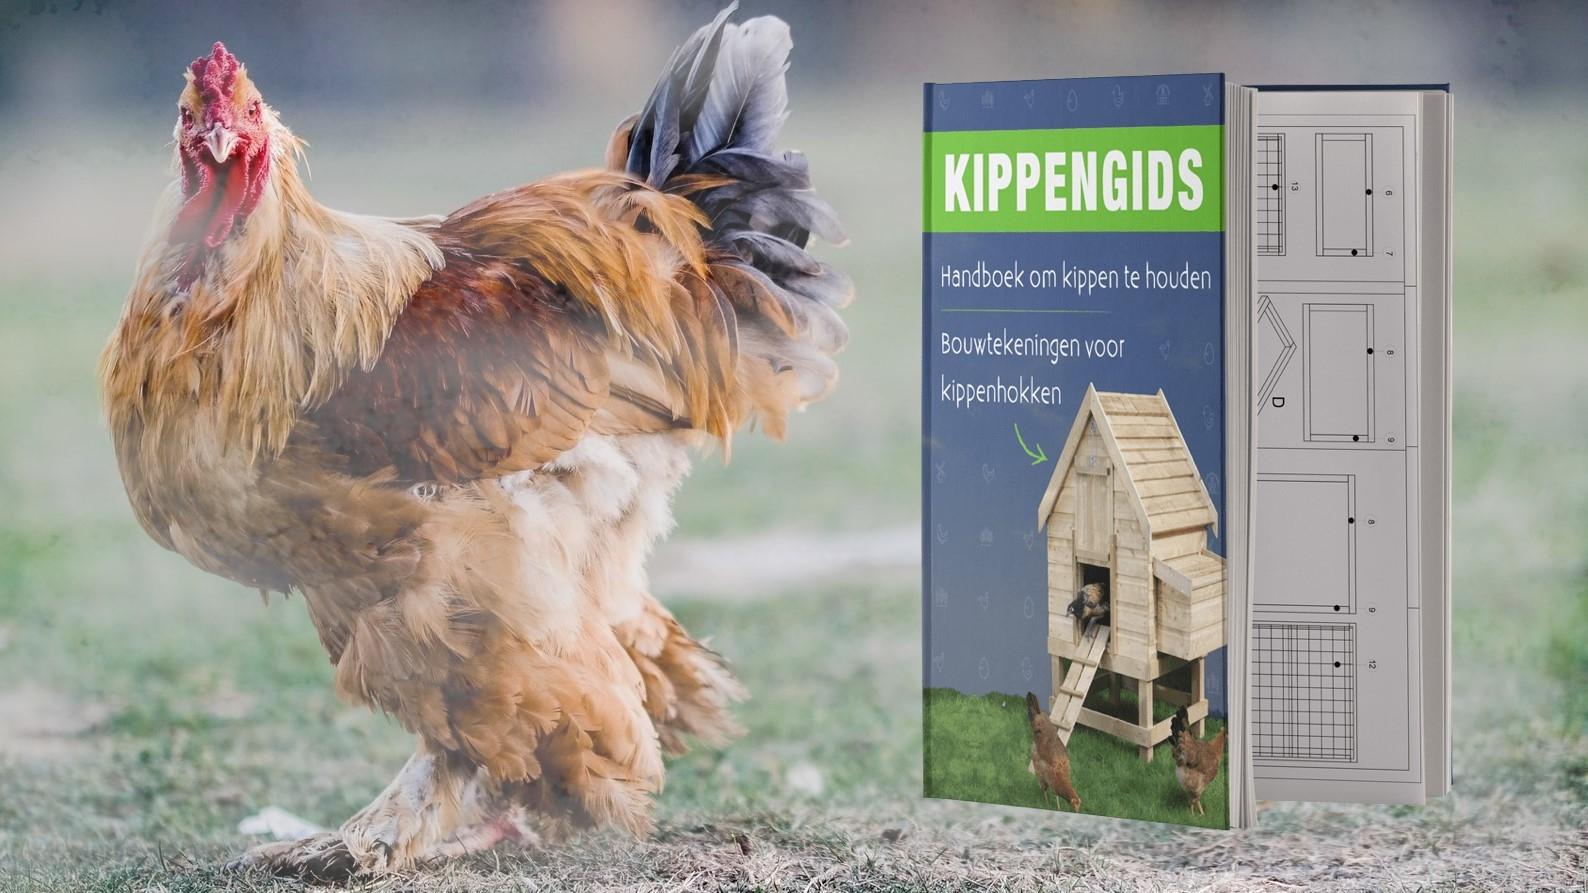 De Kippengids review